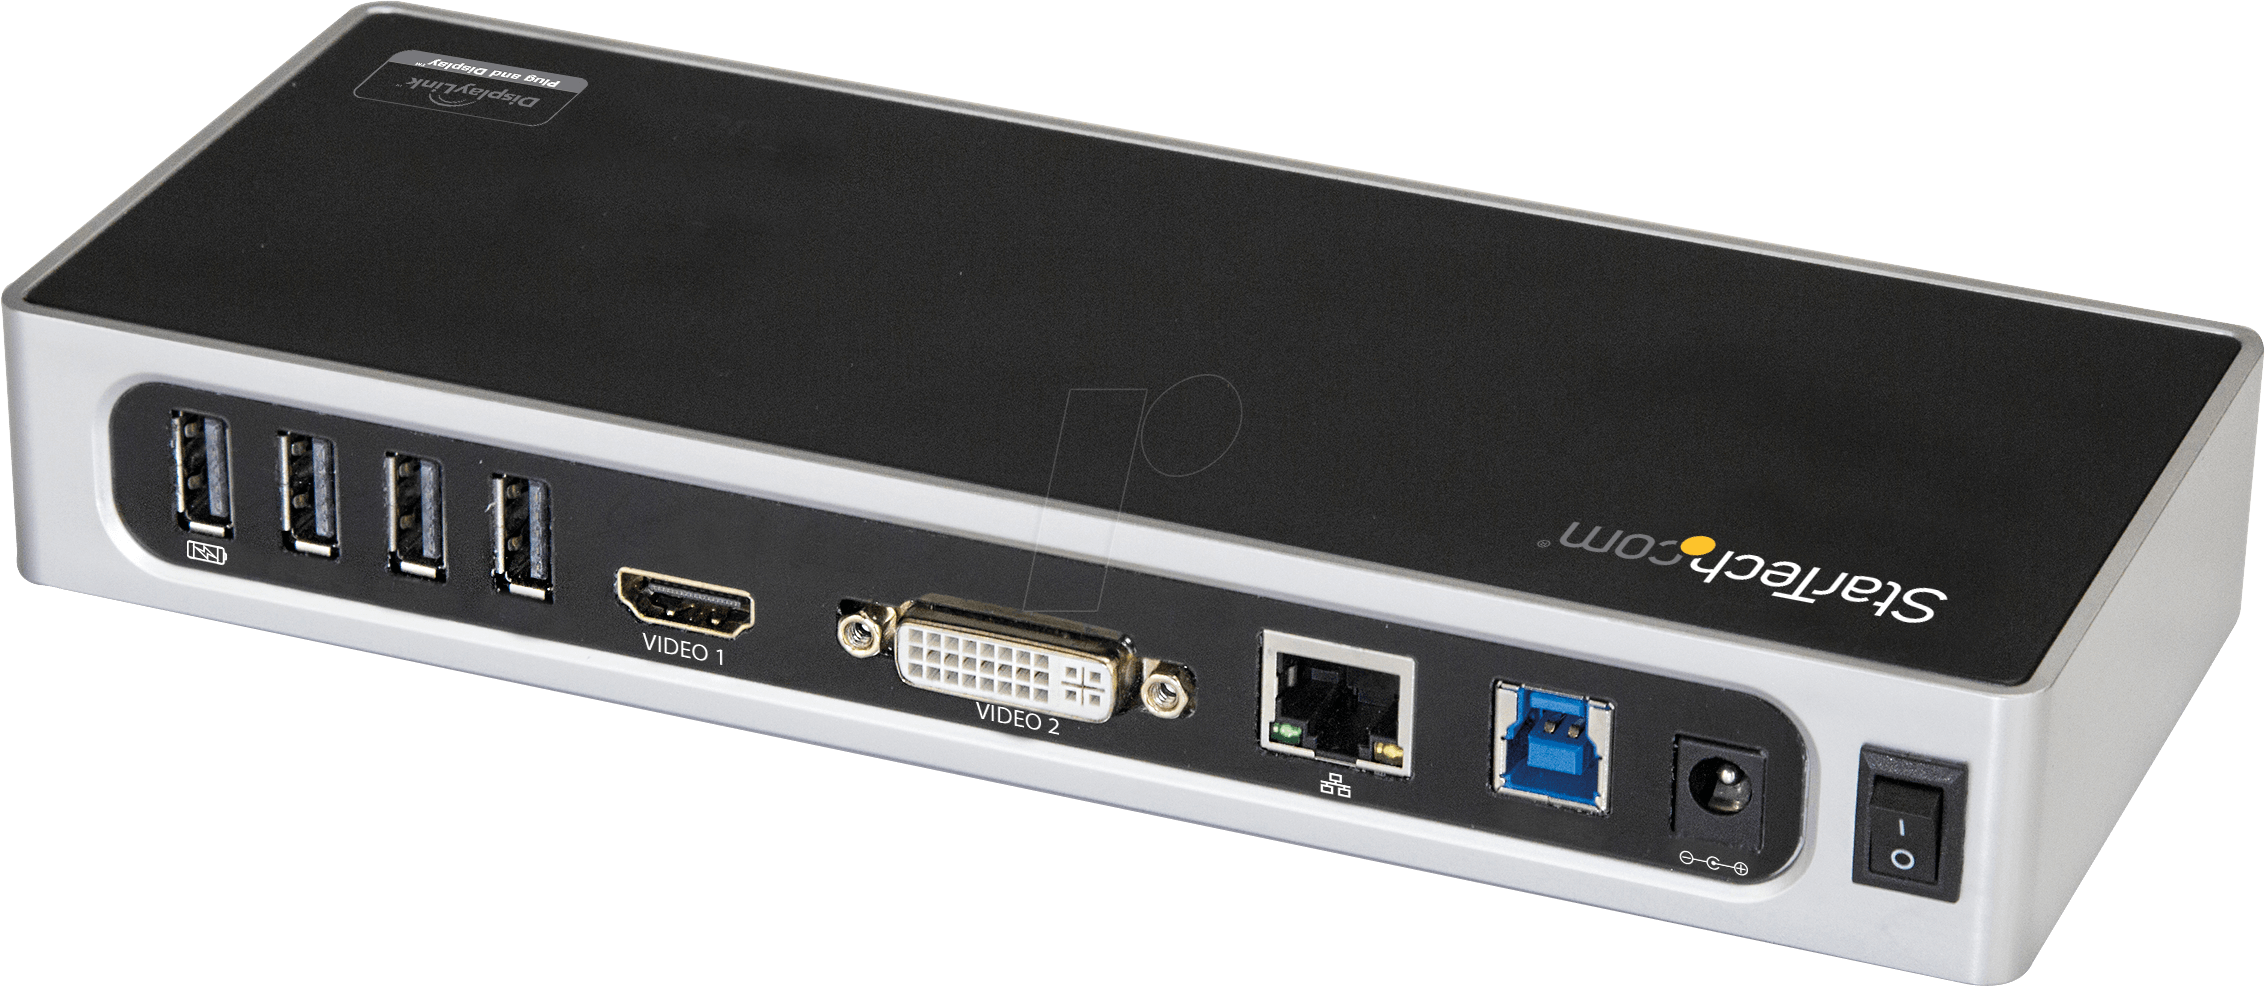 6 x USB 3.0 USB to VGA or DVI StarTech.com USB 3.0 Dual Monitor Docking Station DK30ADD Port Replicator Mac /& Windows USB to HDMI